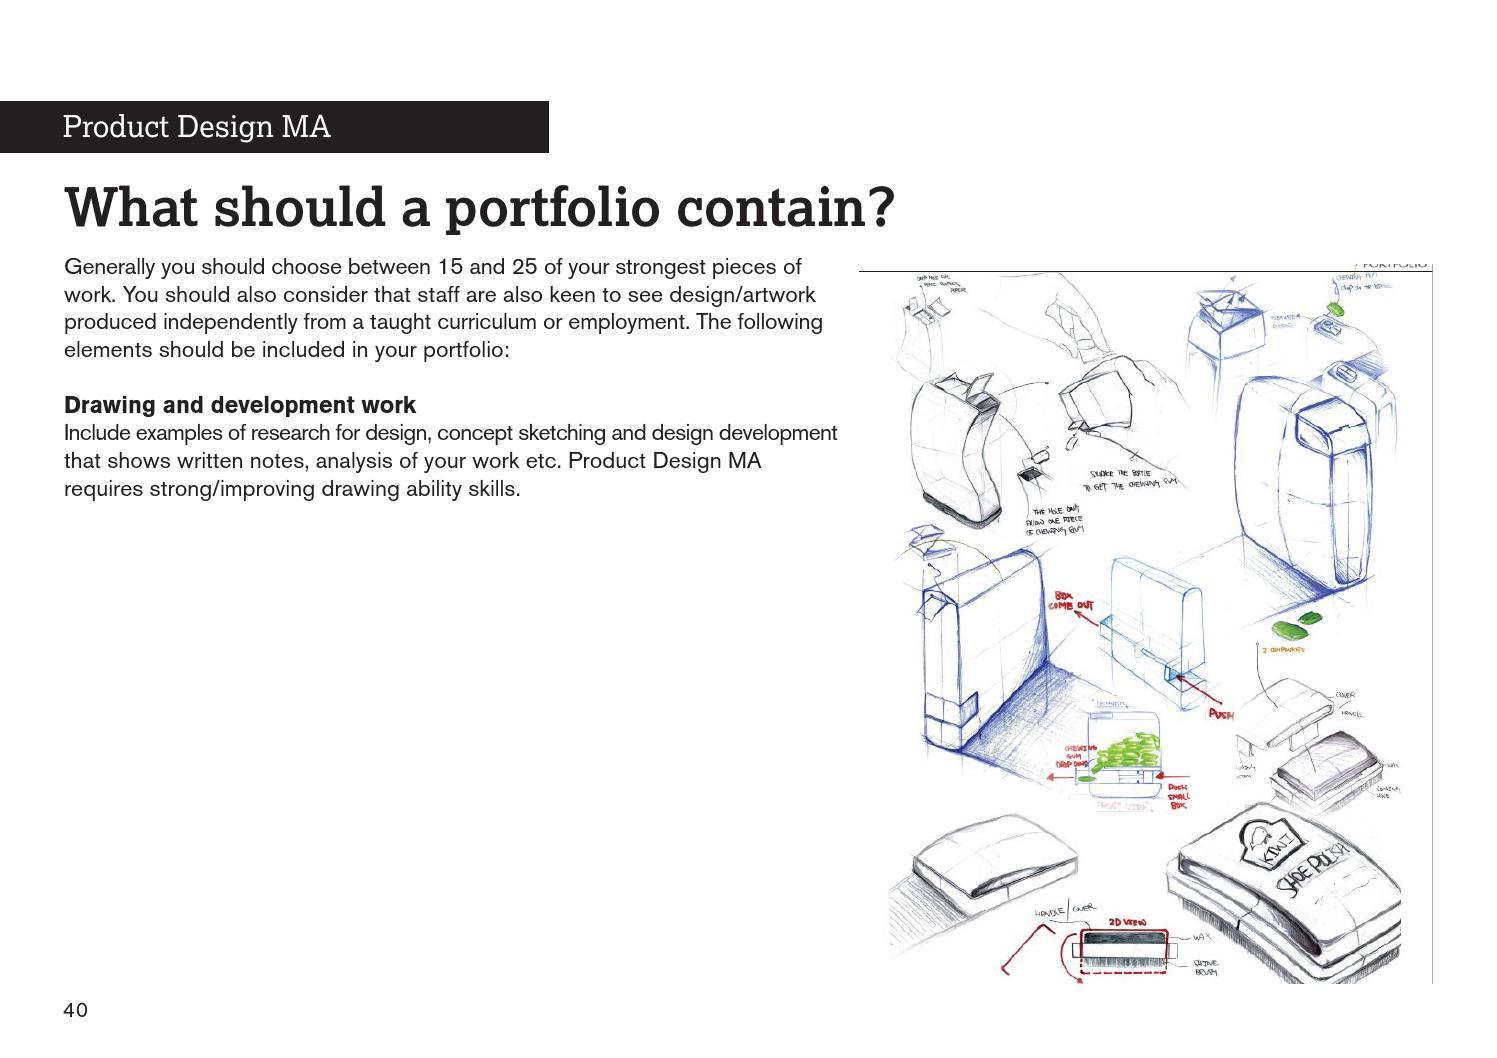 School of Design - portfolio advice by De Montfort